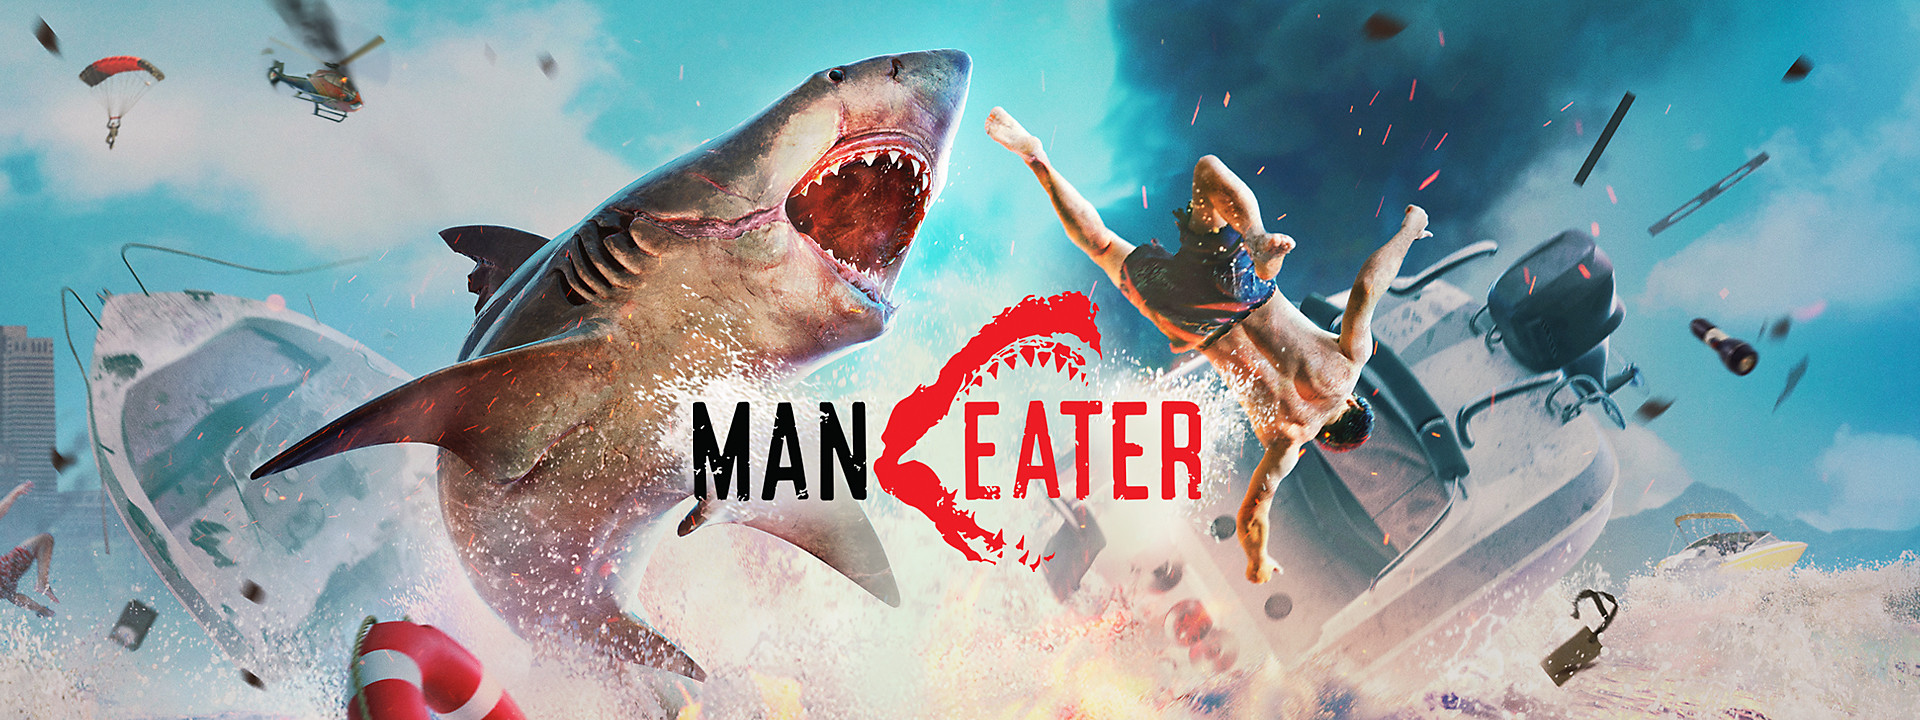 Maneater è in arrivo su PlayStation 5 e Xbox One Series X 3